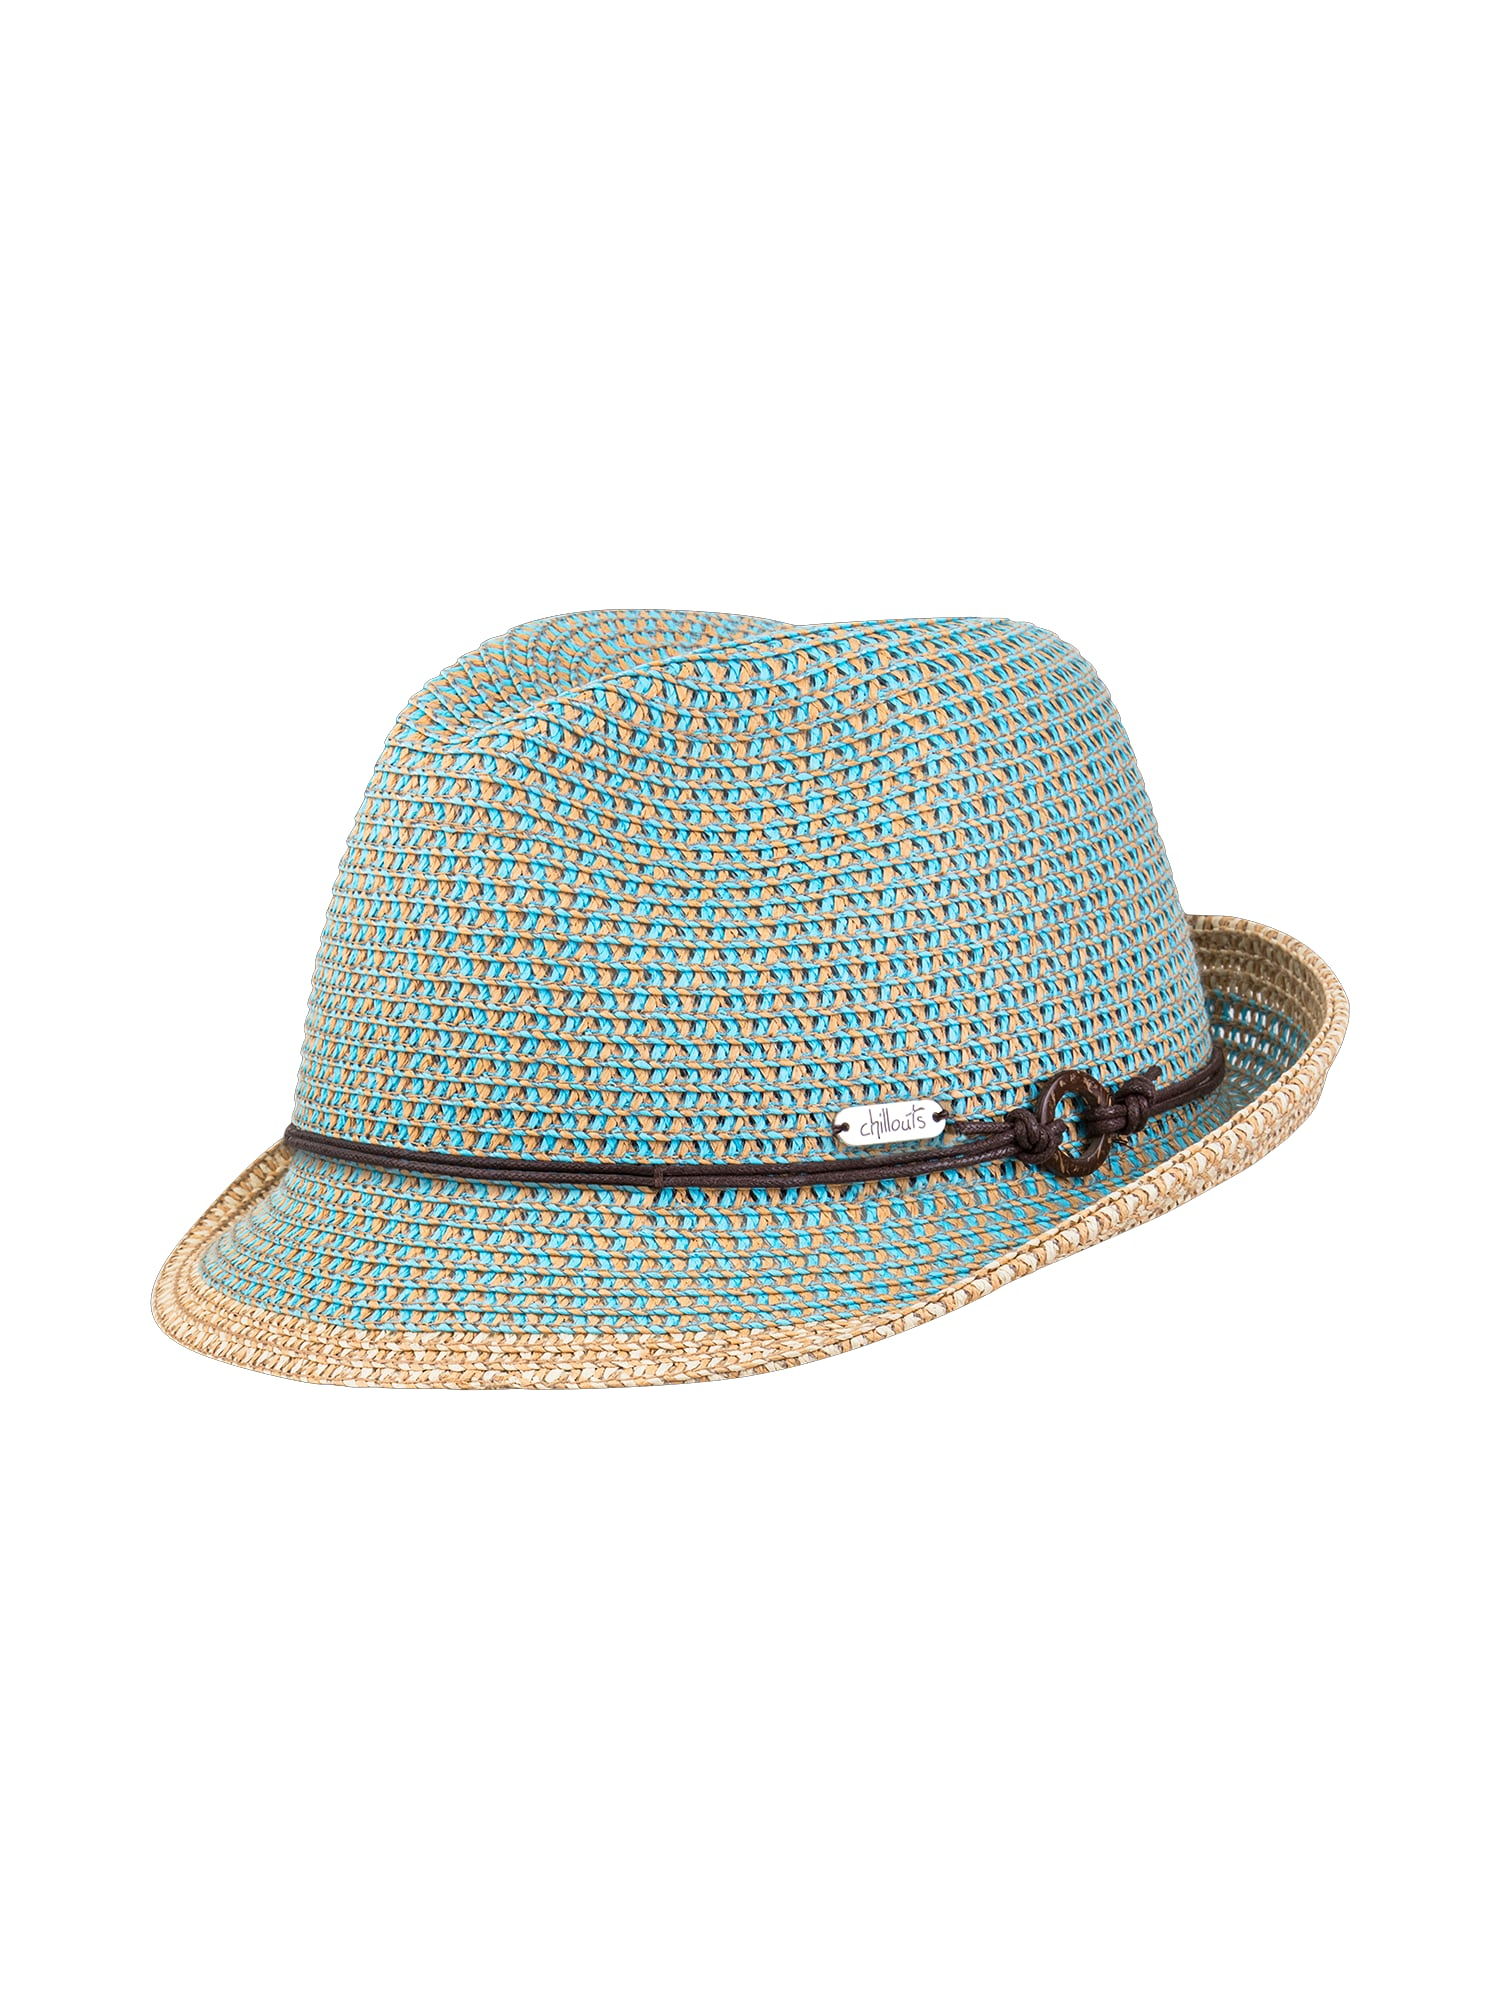 Chillouts, Dames Hoed 'Rimini Hat', lichtblauw